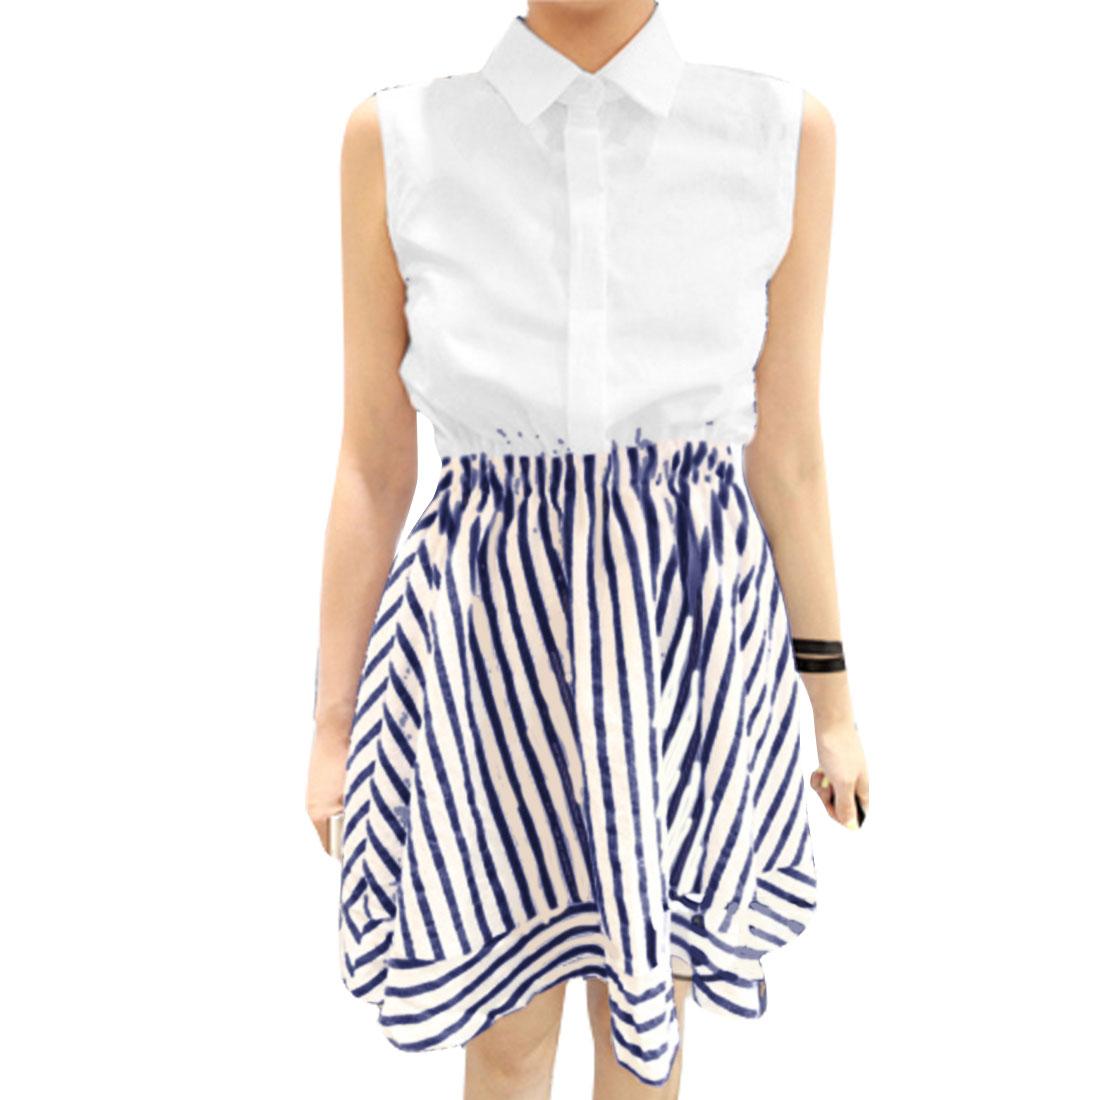 Lady Sleeveless Button Hidden Front Stripes Pattern White Navy Blue Dress XS